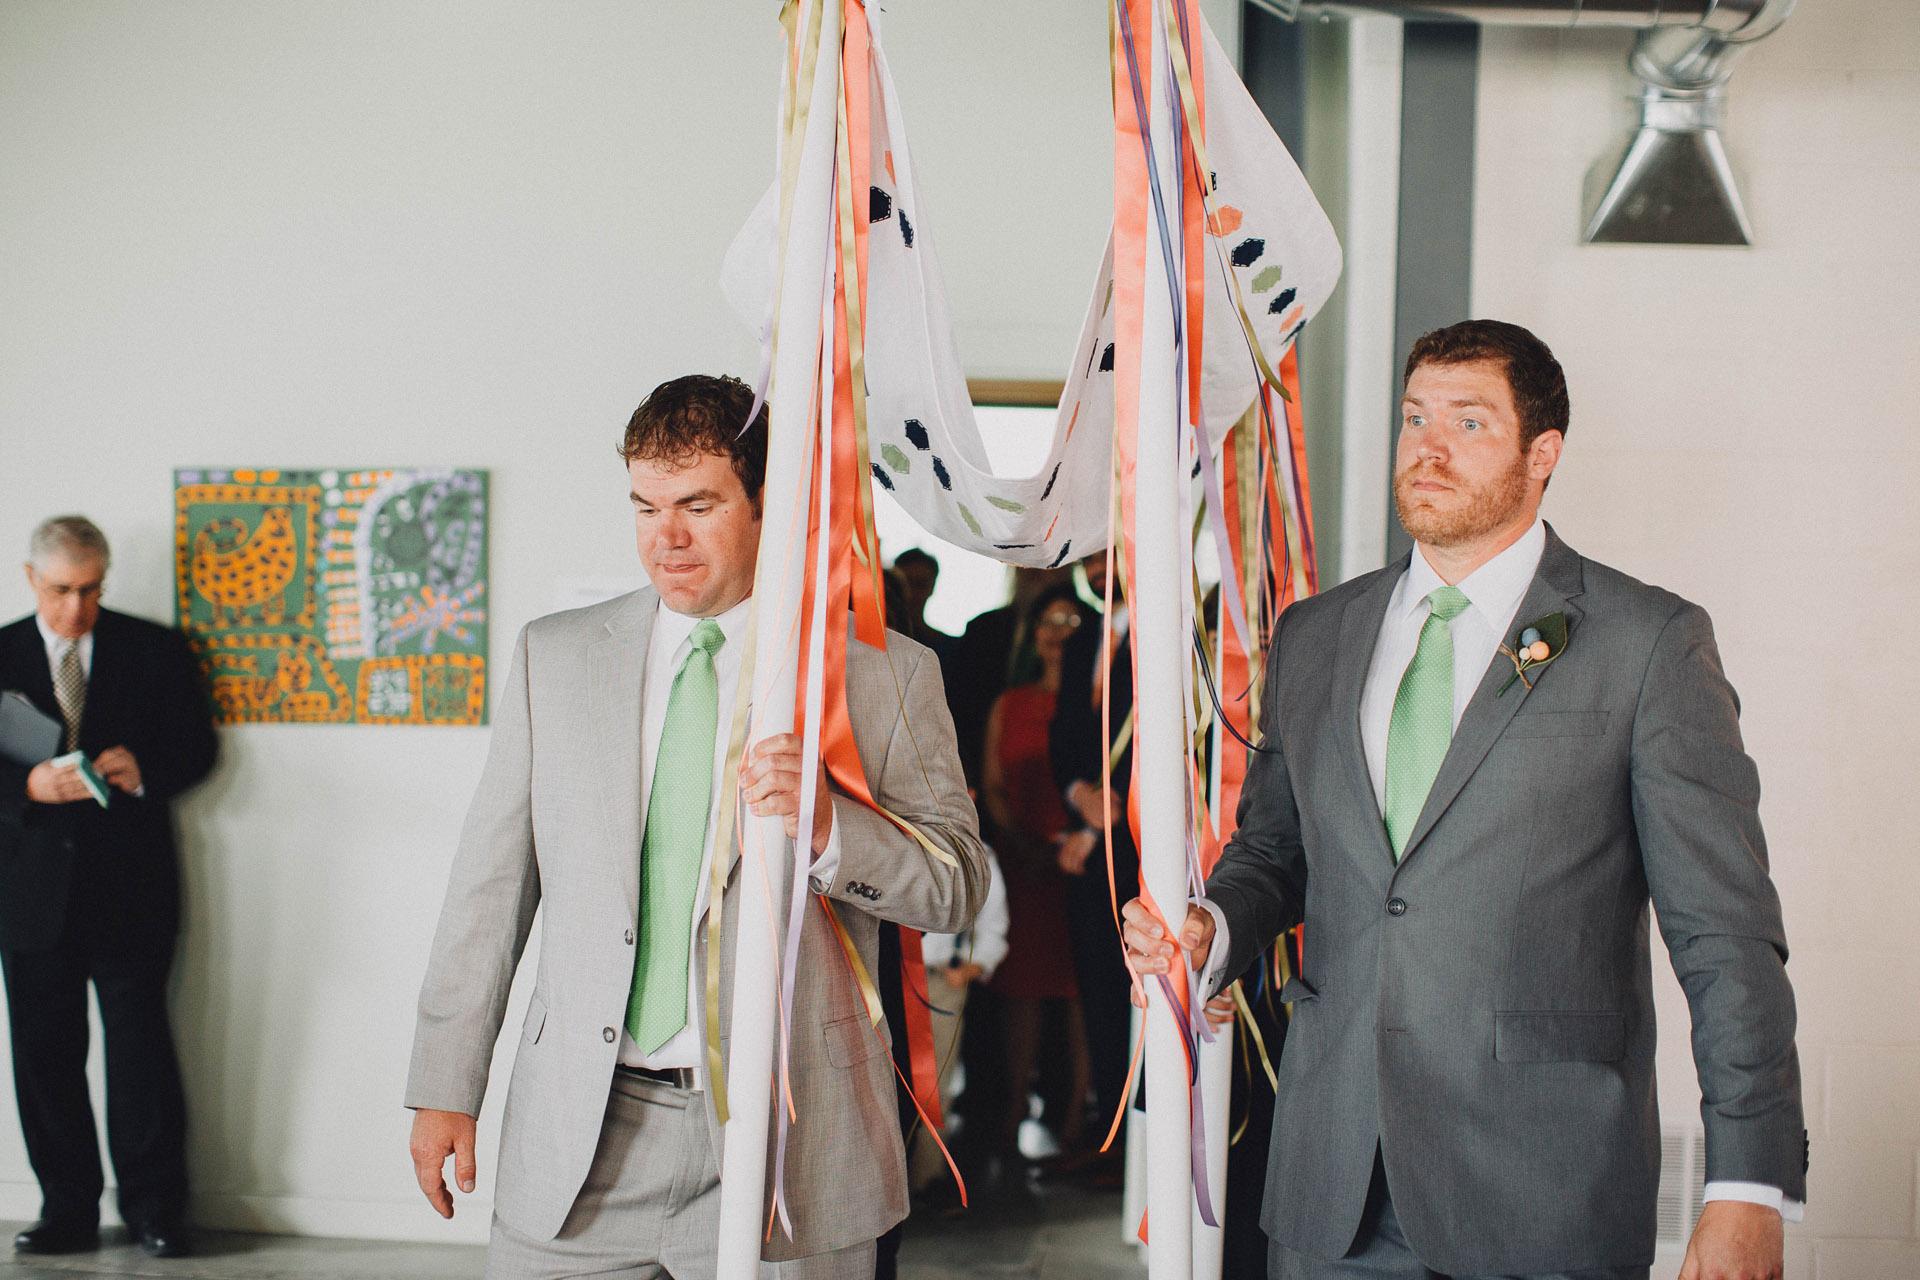 Bethany-Peter-Cincinnati-Pallet-23-Wedding-036.jpg